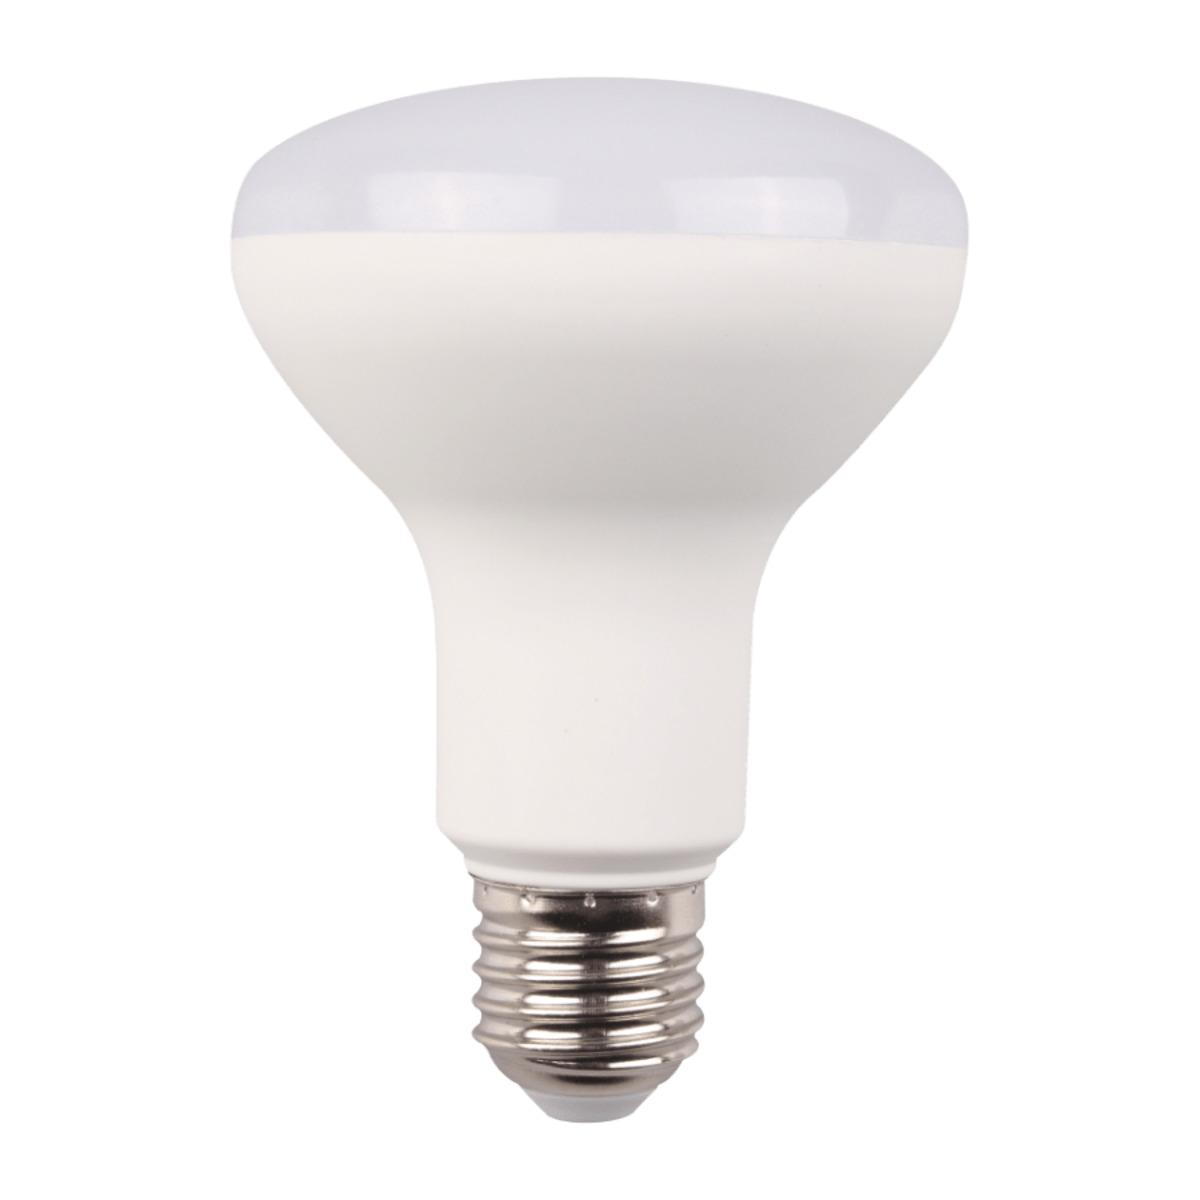 Bild 3 von LIGHTZONE     LED-Reflektor